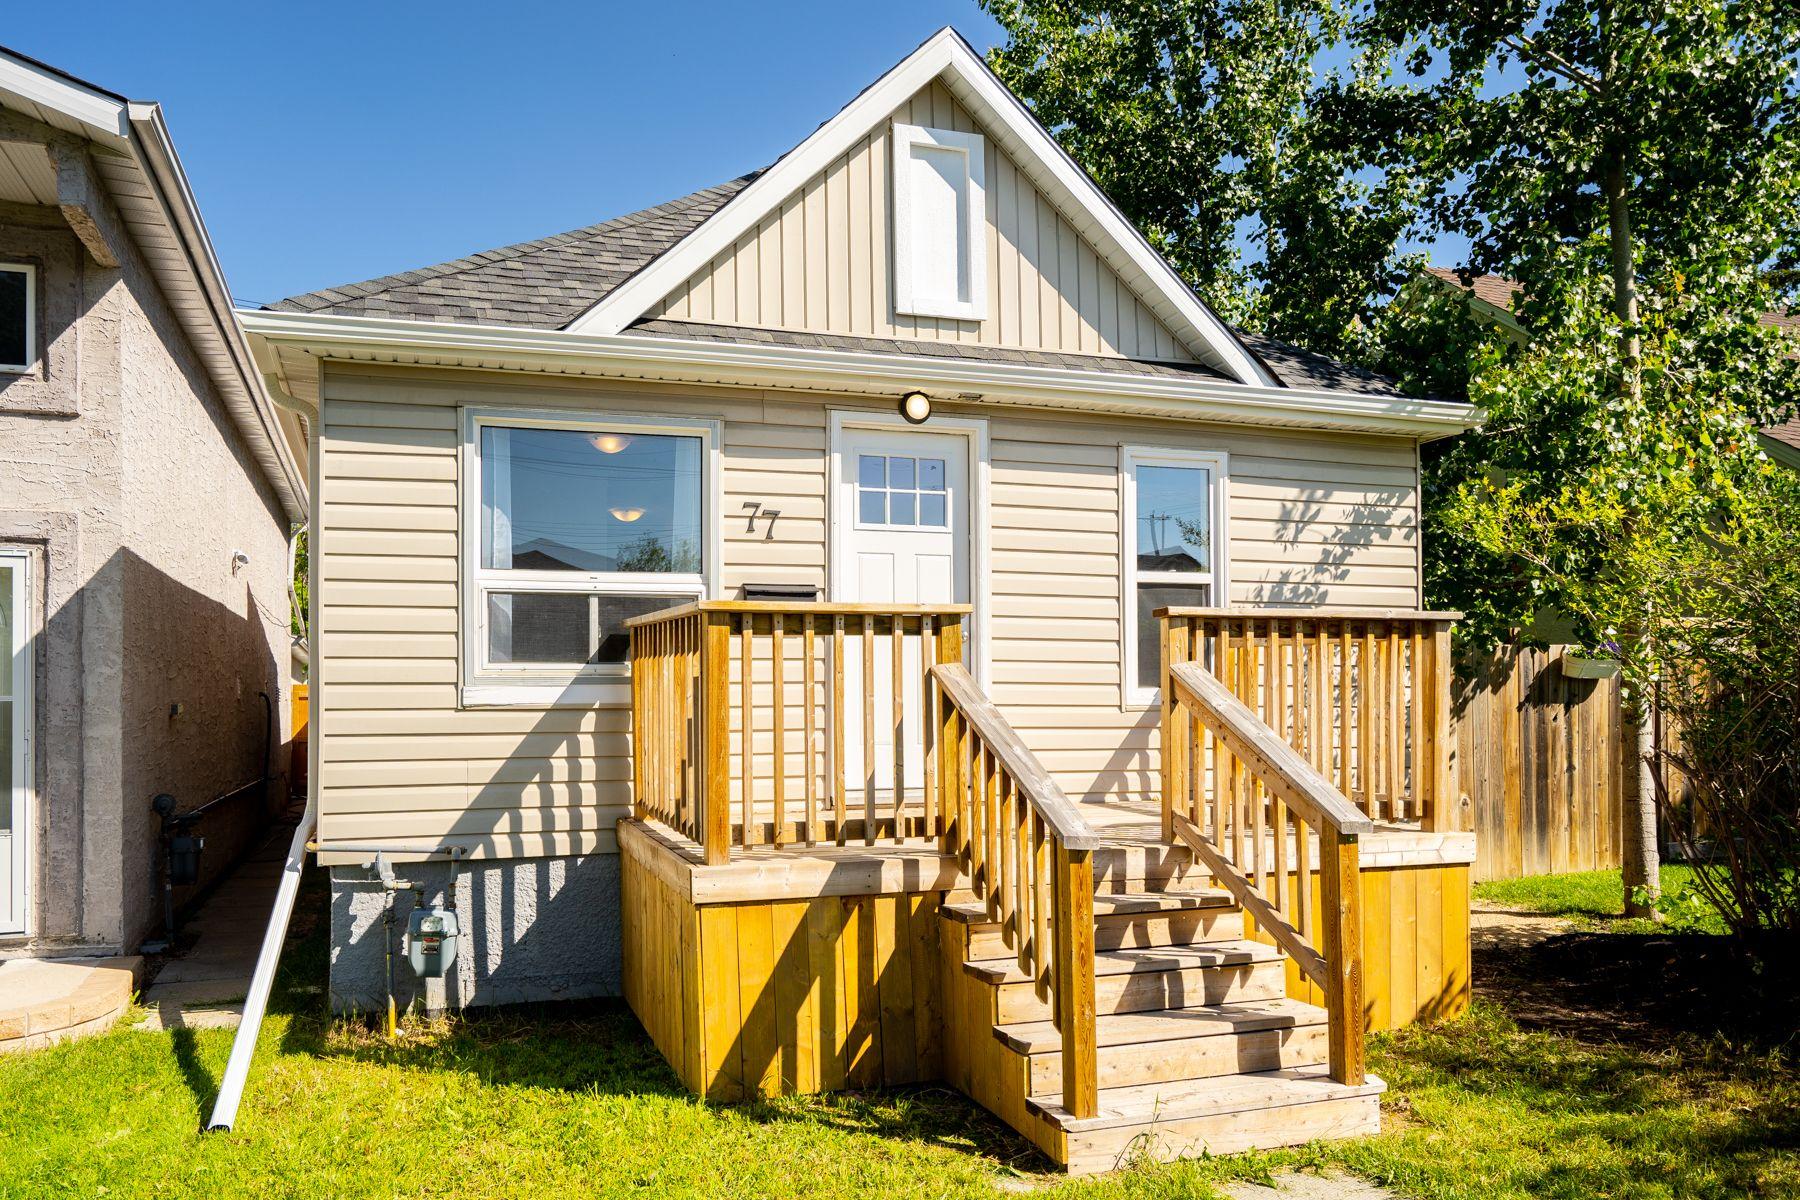 Main Photo: 77 Harrowby Avenue in Winnipeg: St Vital House for sale (2D)  : MLS®# 202014404